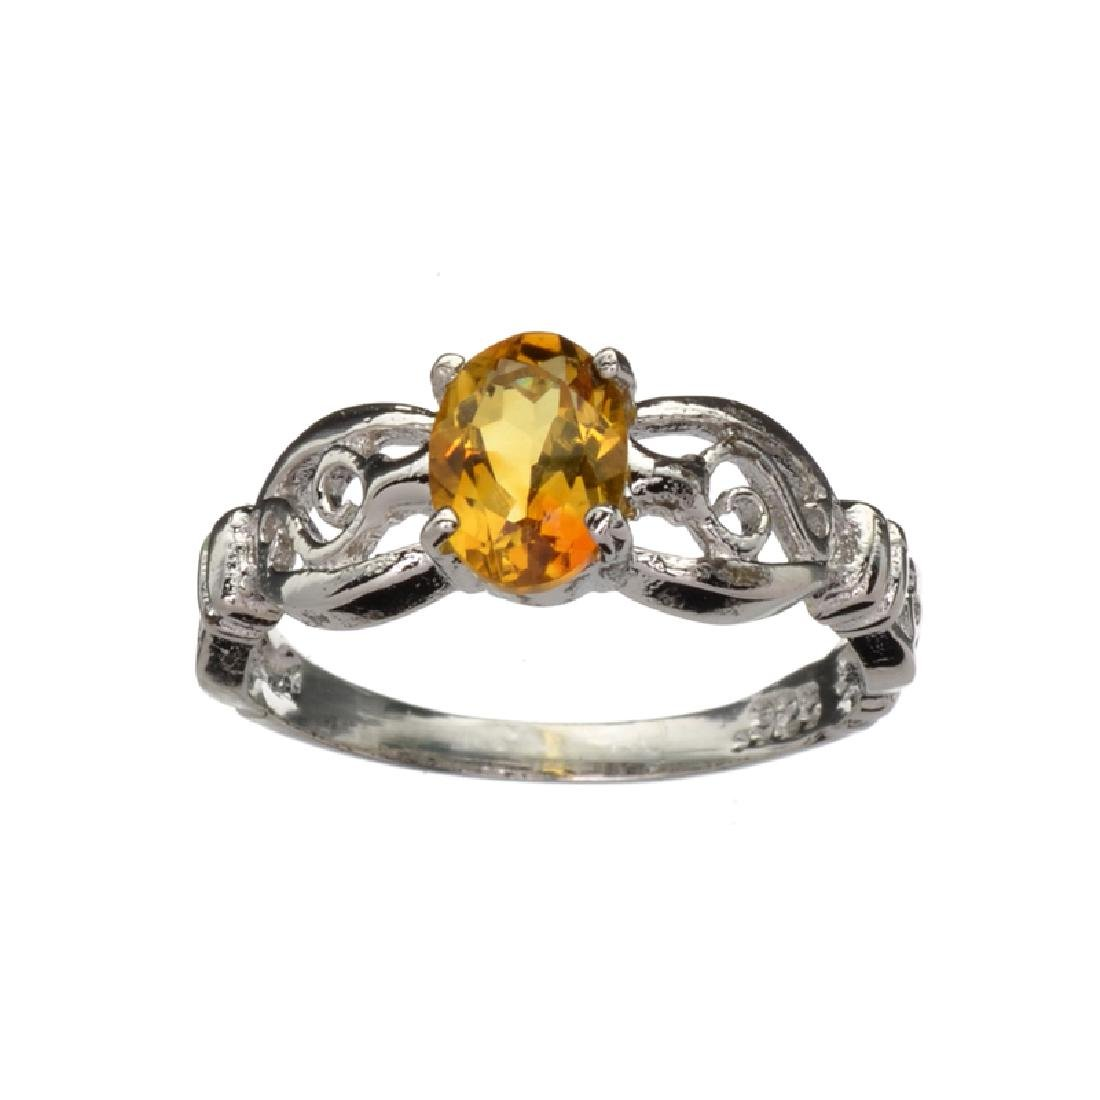 APP: 0.6k Fine Jewelry 0.86CT Oval Cut Golden Citrine